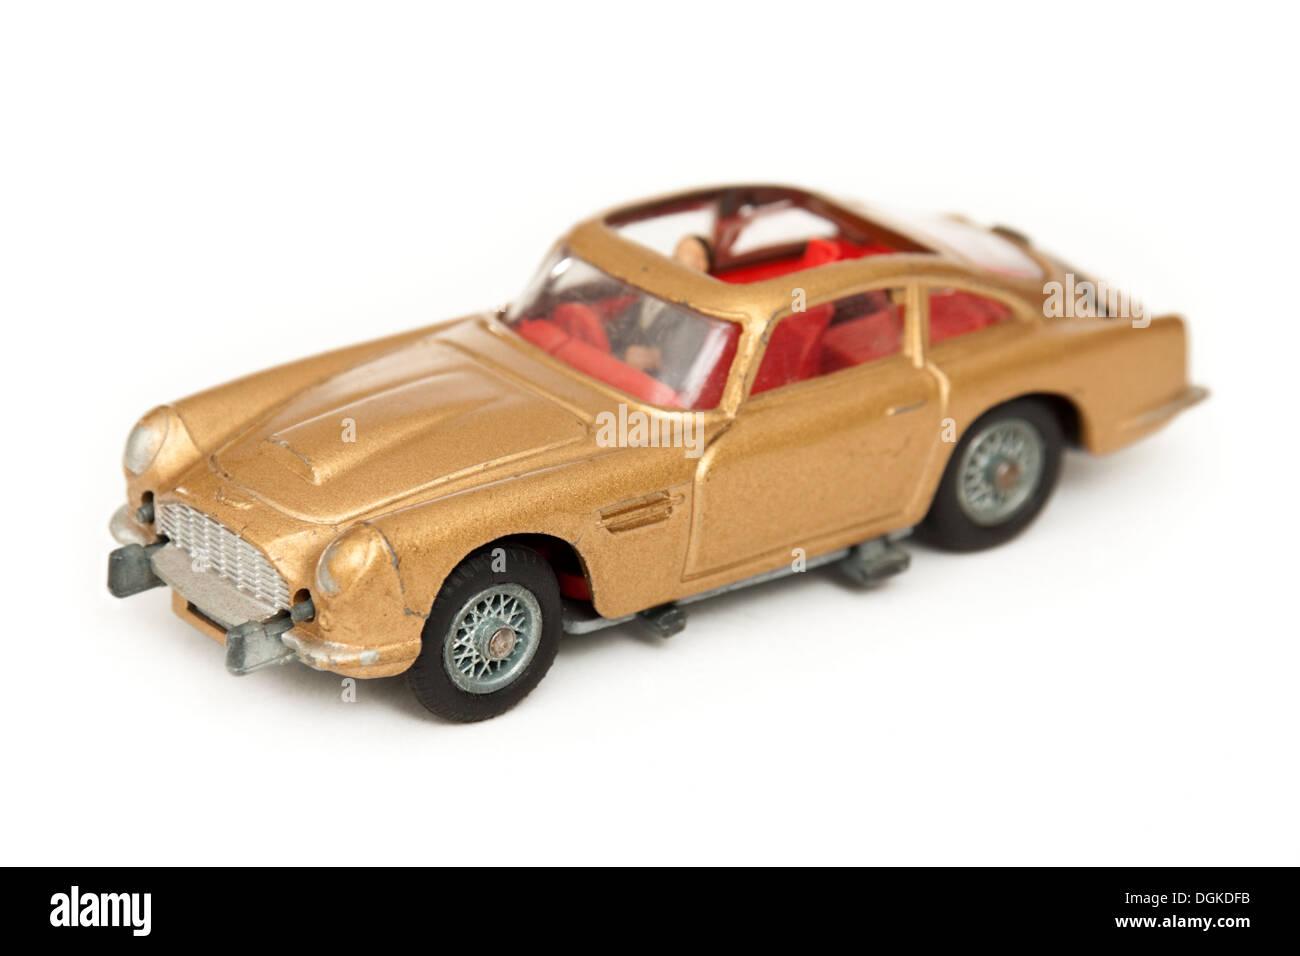 James Bond 007 Aston Martin Db5 Replica By Corgi Toys Stock Photo Alamy